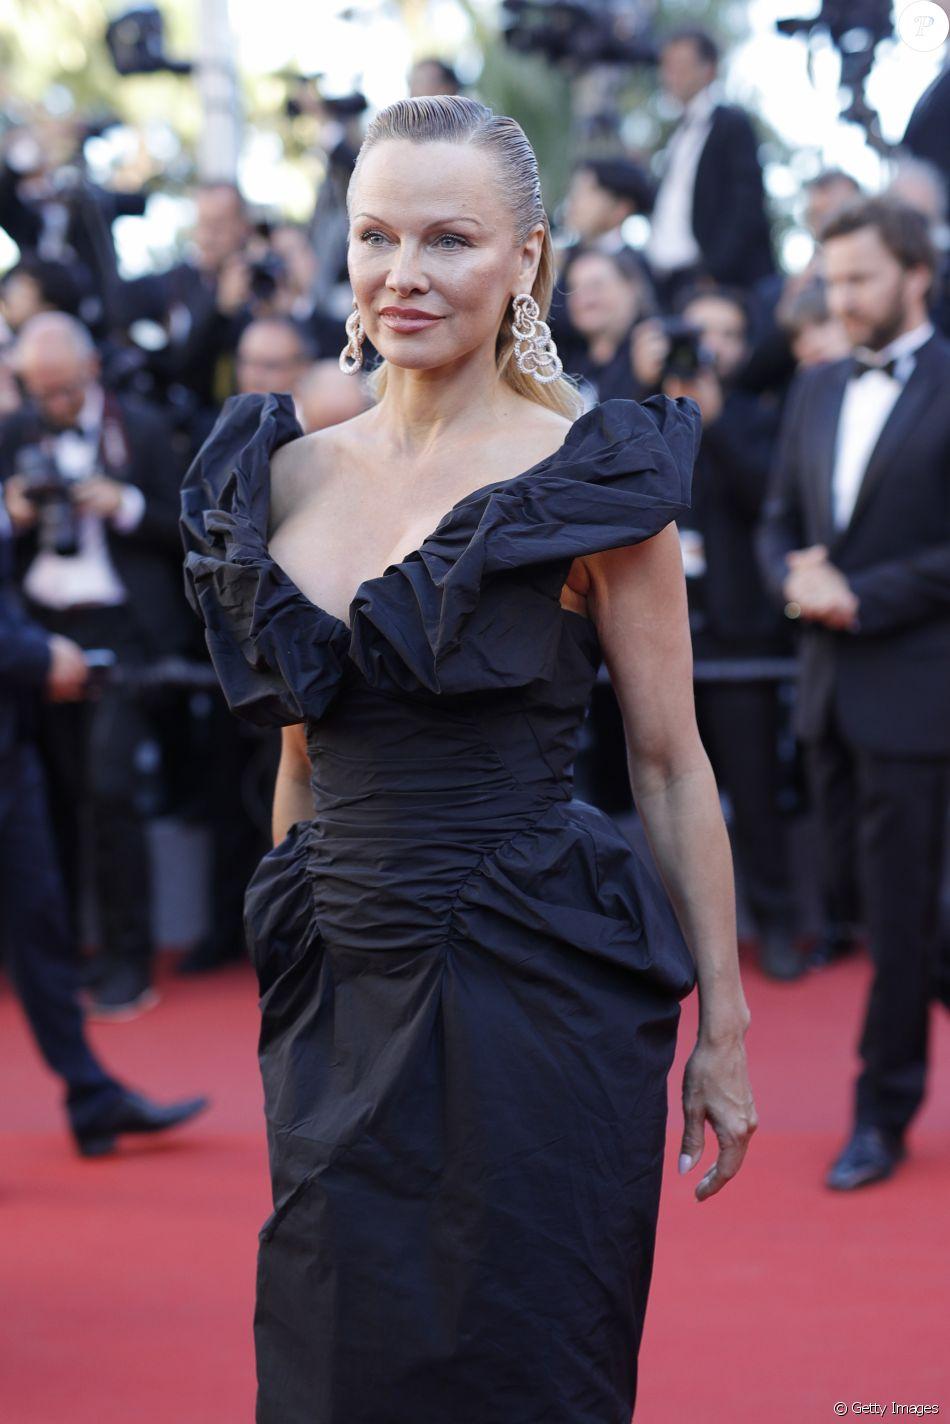 Pamela Anderson prestigiou a pré-estreia do filme '120 Battements Par Minute' no Festival de Cannes 2017